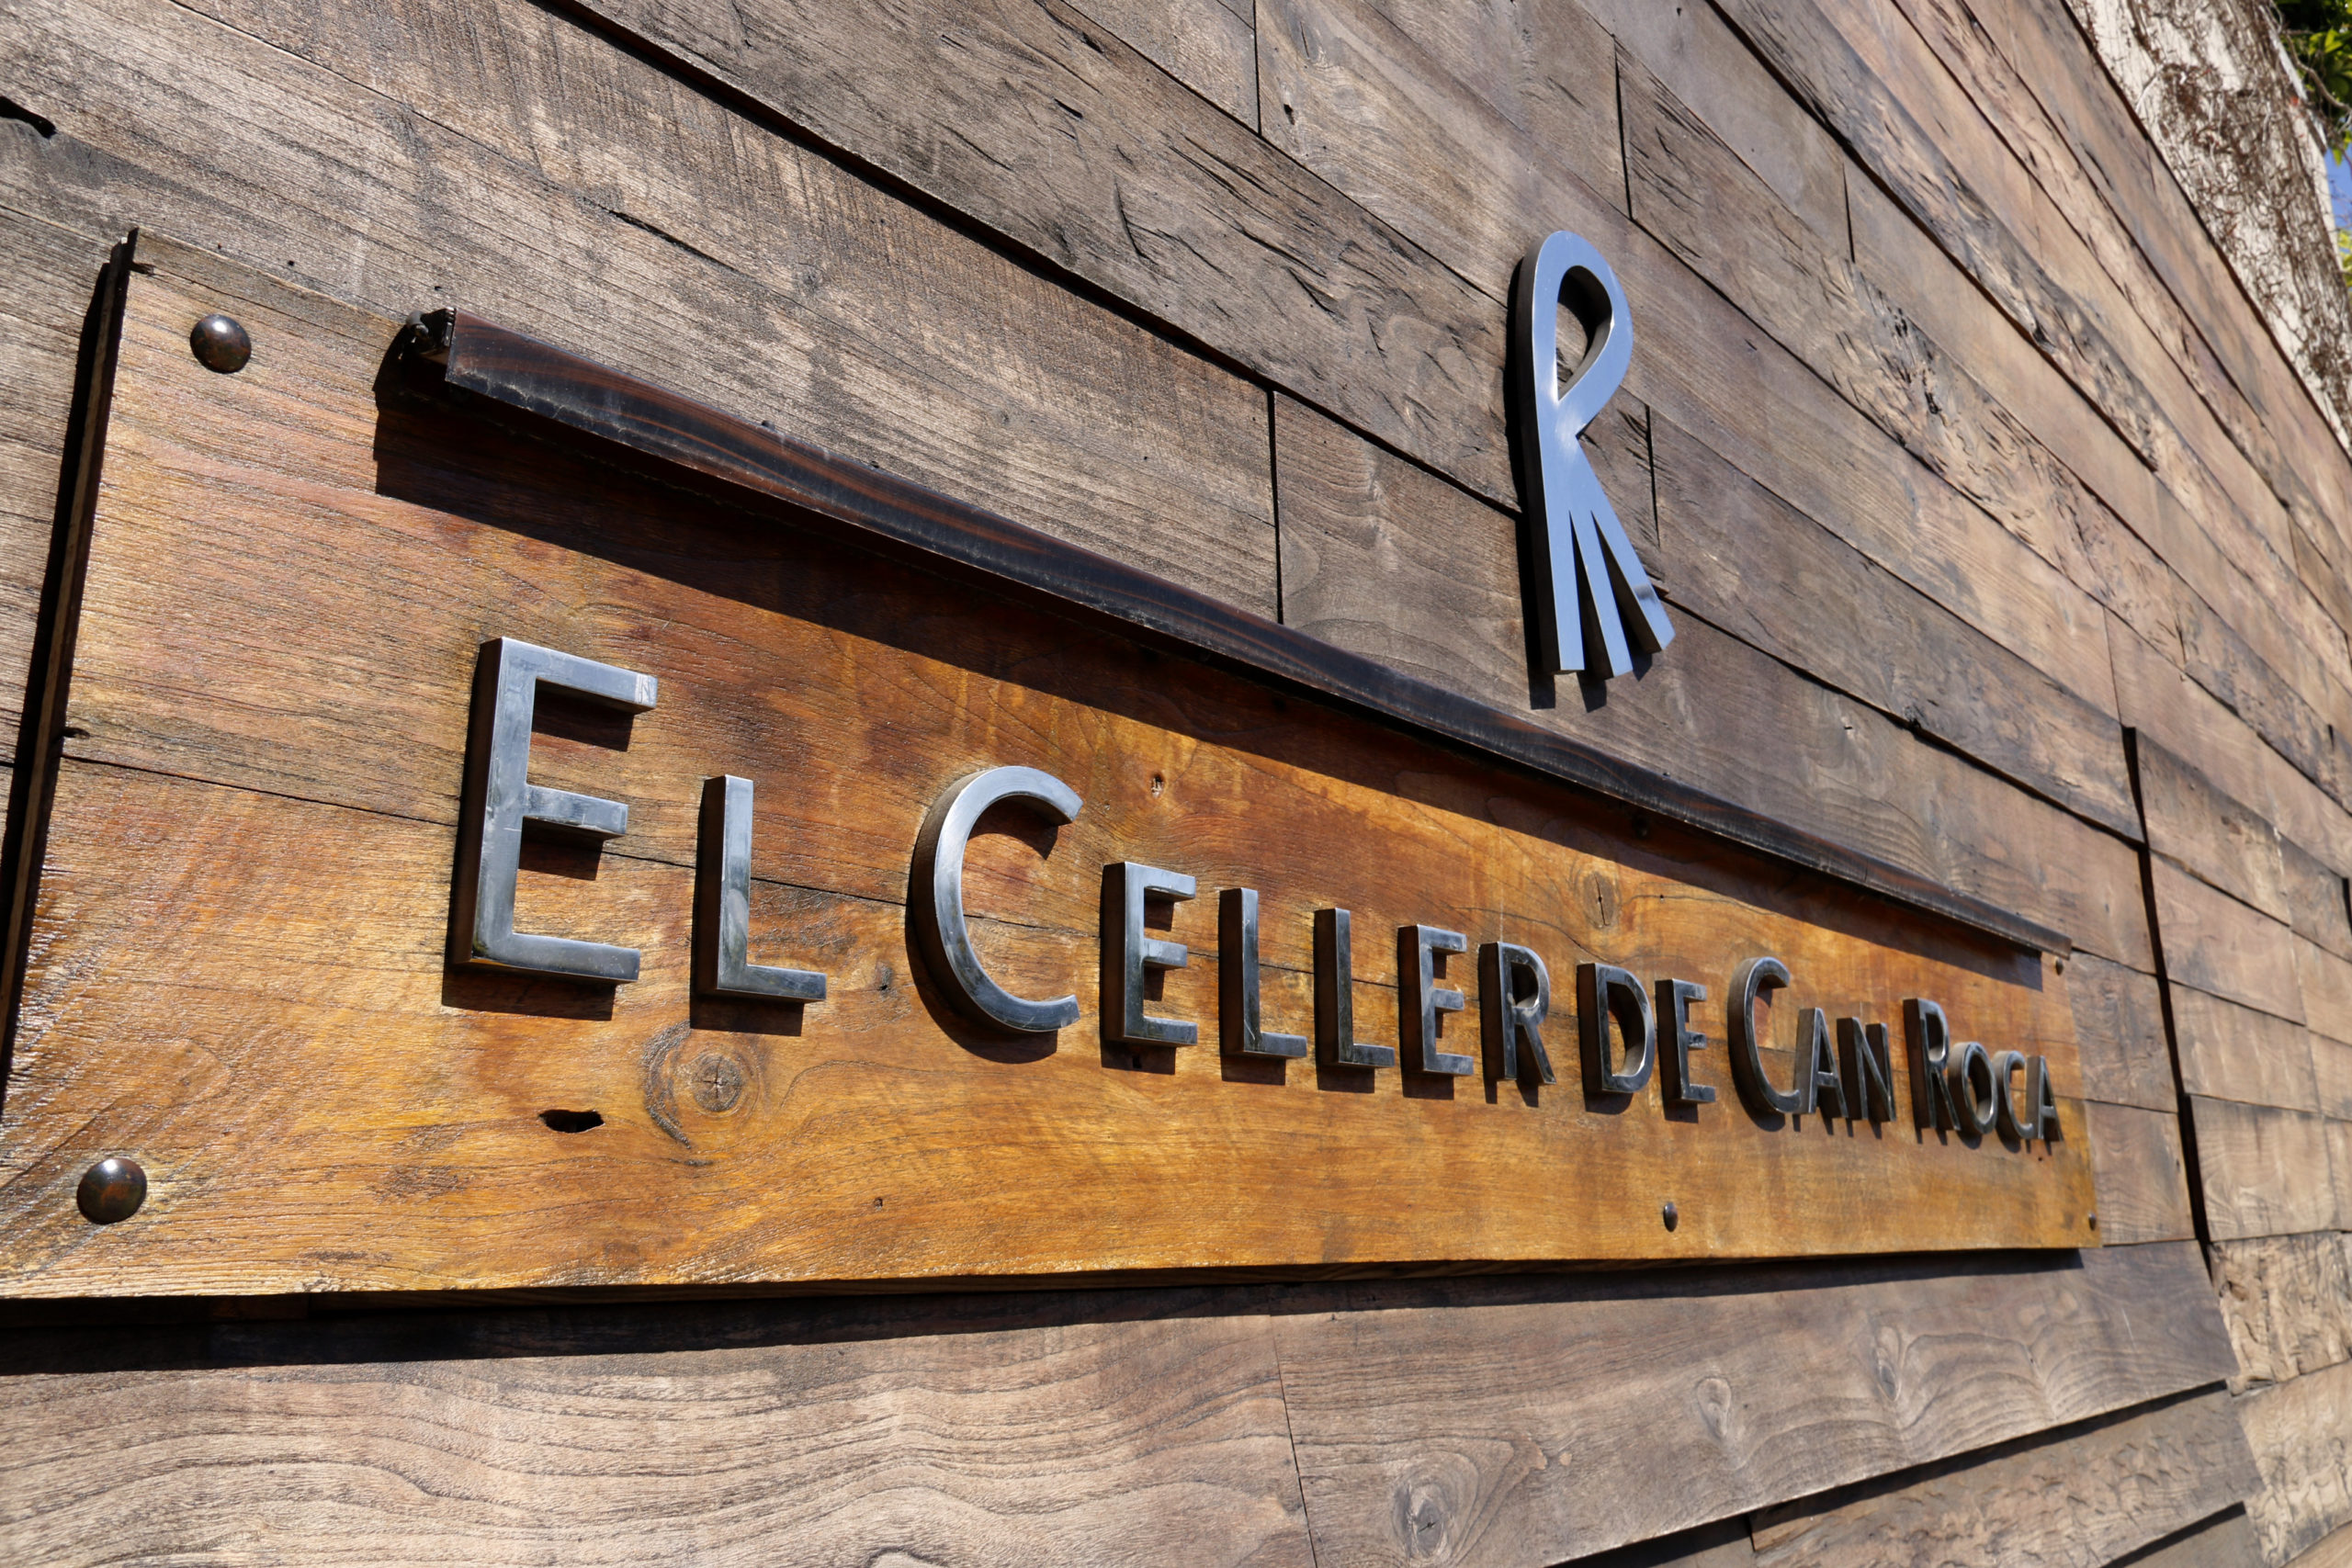 El cartell del restaurant El Celler de Can Roca | ACN